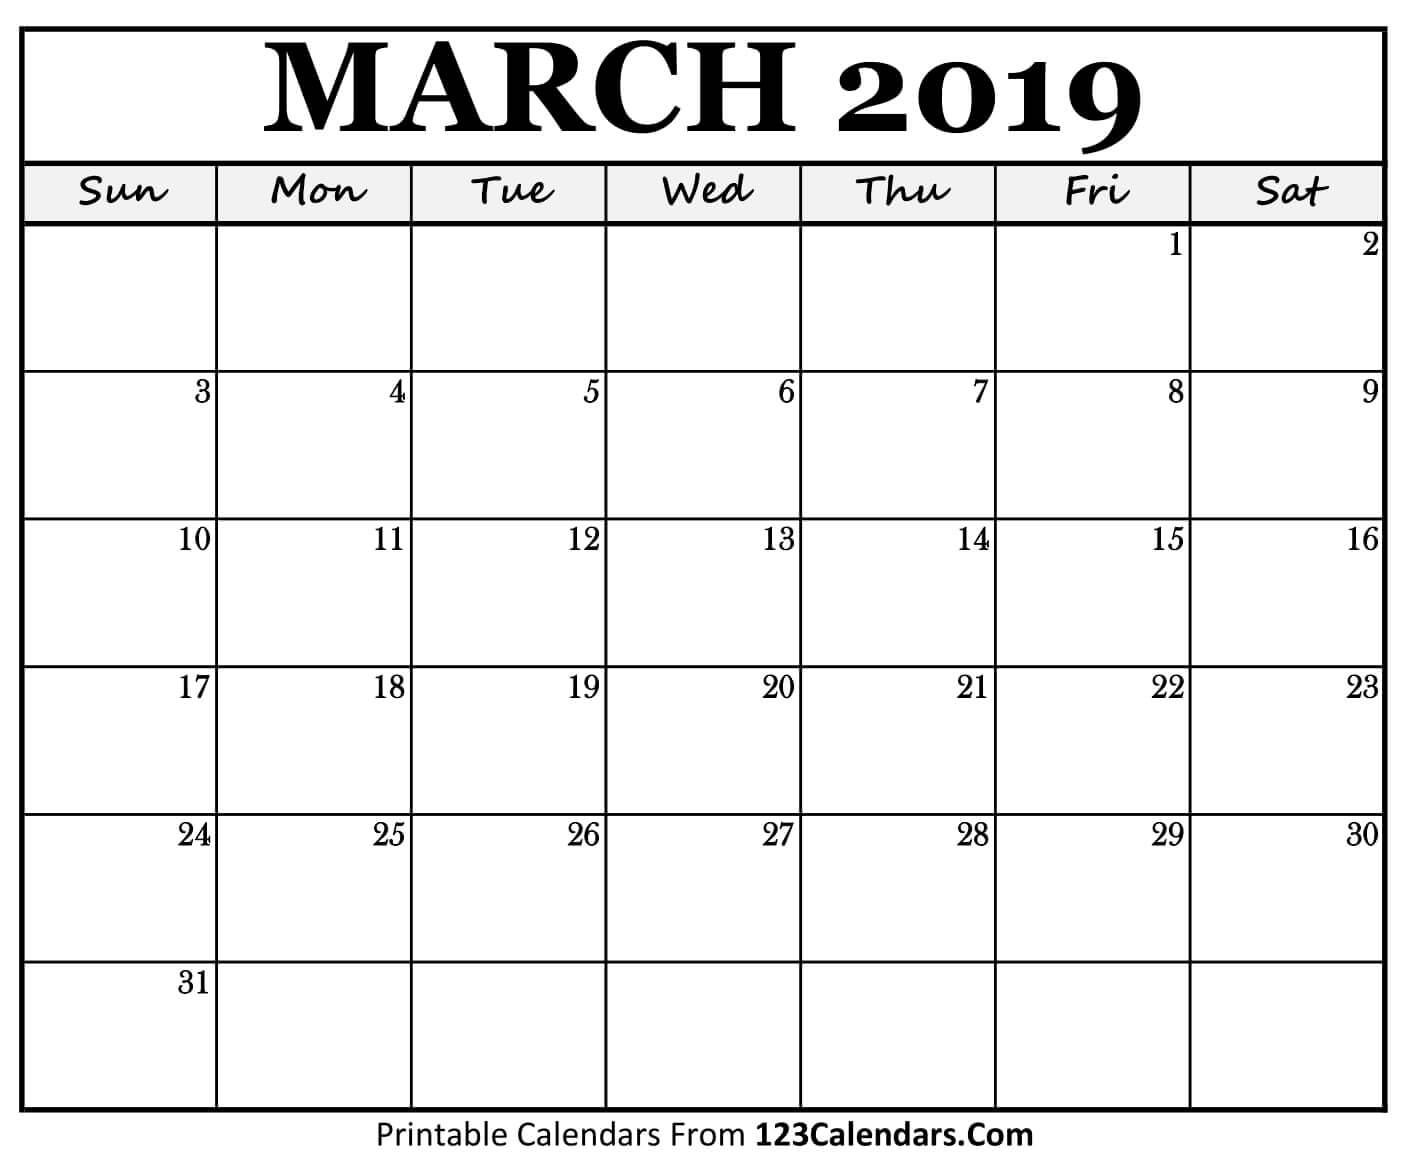 Printable March 2019 Calendar Templates 123Calendars | Isacl